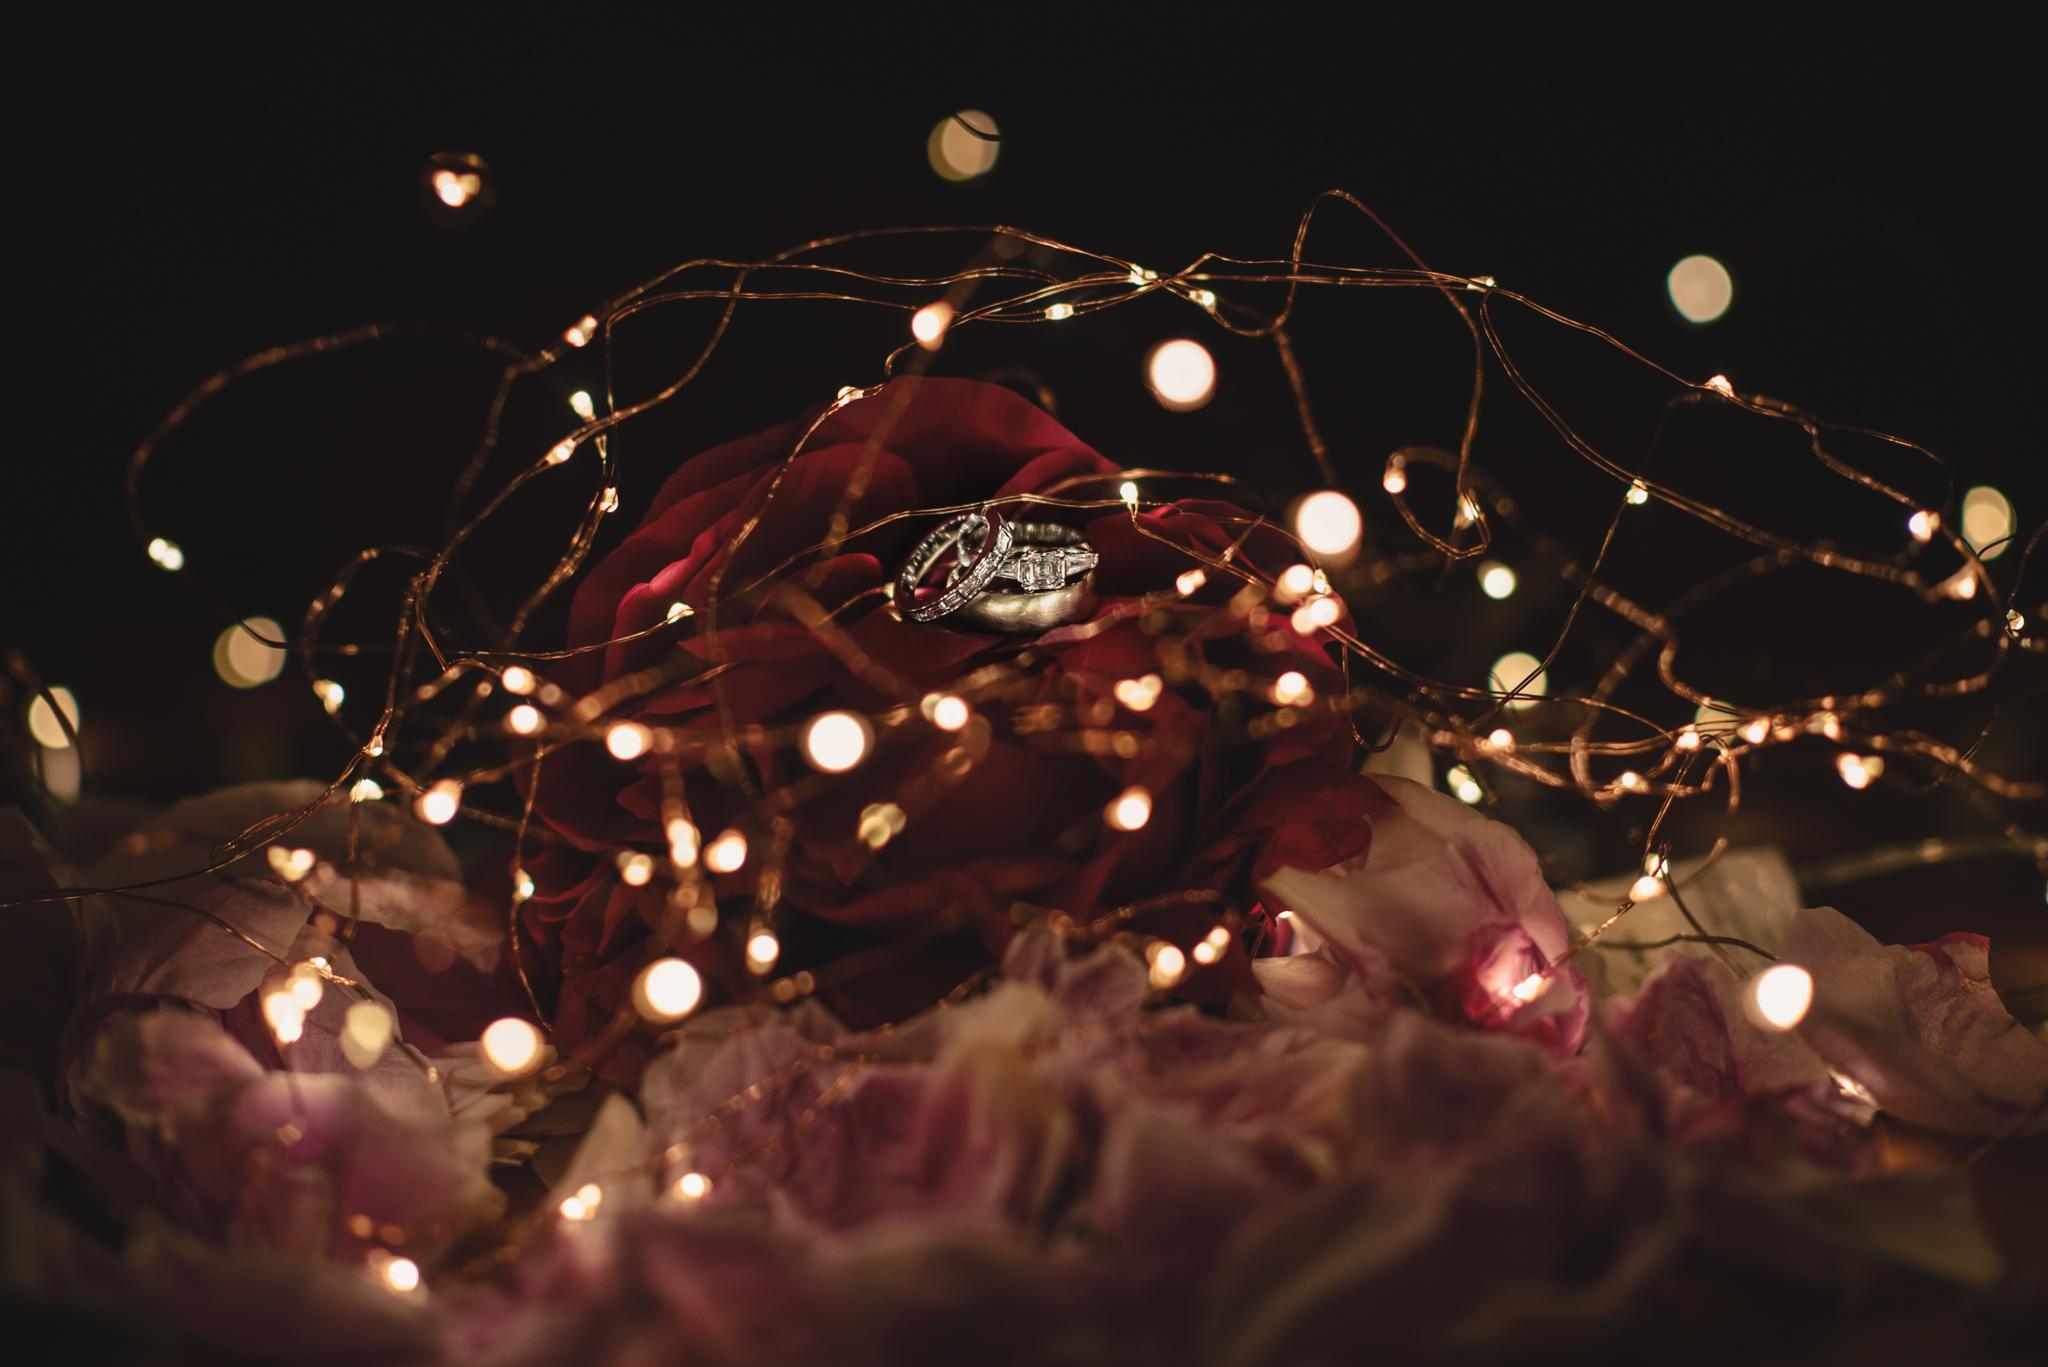 LOVELENSCAPES PHOTOGRAPHY • VISUAL POETRY • NEW ZEALAND WEDDING PHOTOGRAPHER • AUSTRALIAN WEDDING PHOTOGRAPHER • BRISBANE • MELBOURNE • SYDNEY • HOBART • TARUREKA ESTATE • ANNA CAMPBELL • 182.jpg